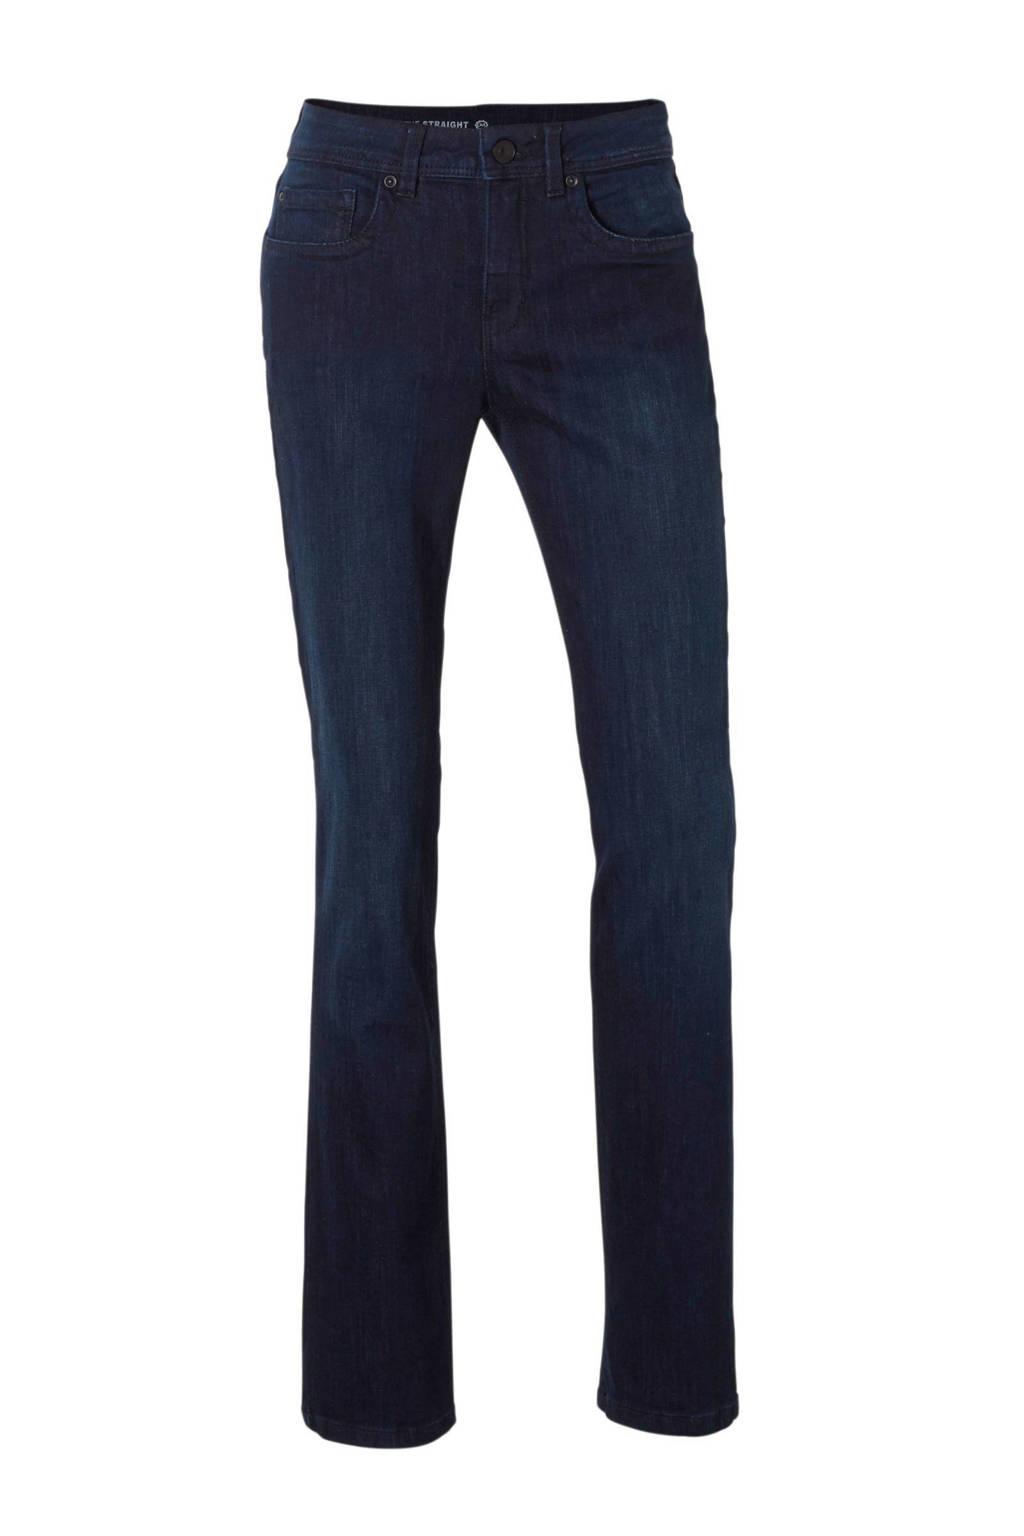 C&A The Denim straight jeans, Blauw